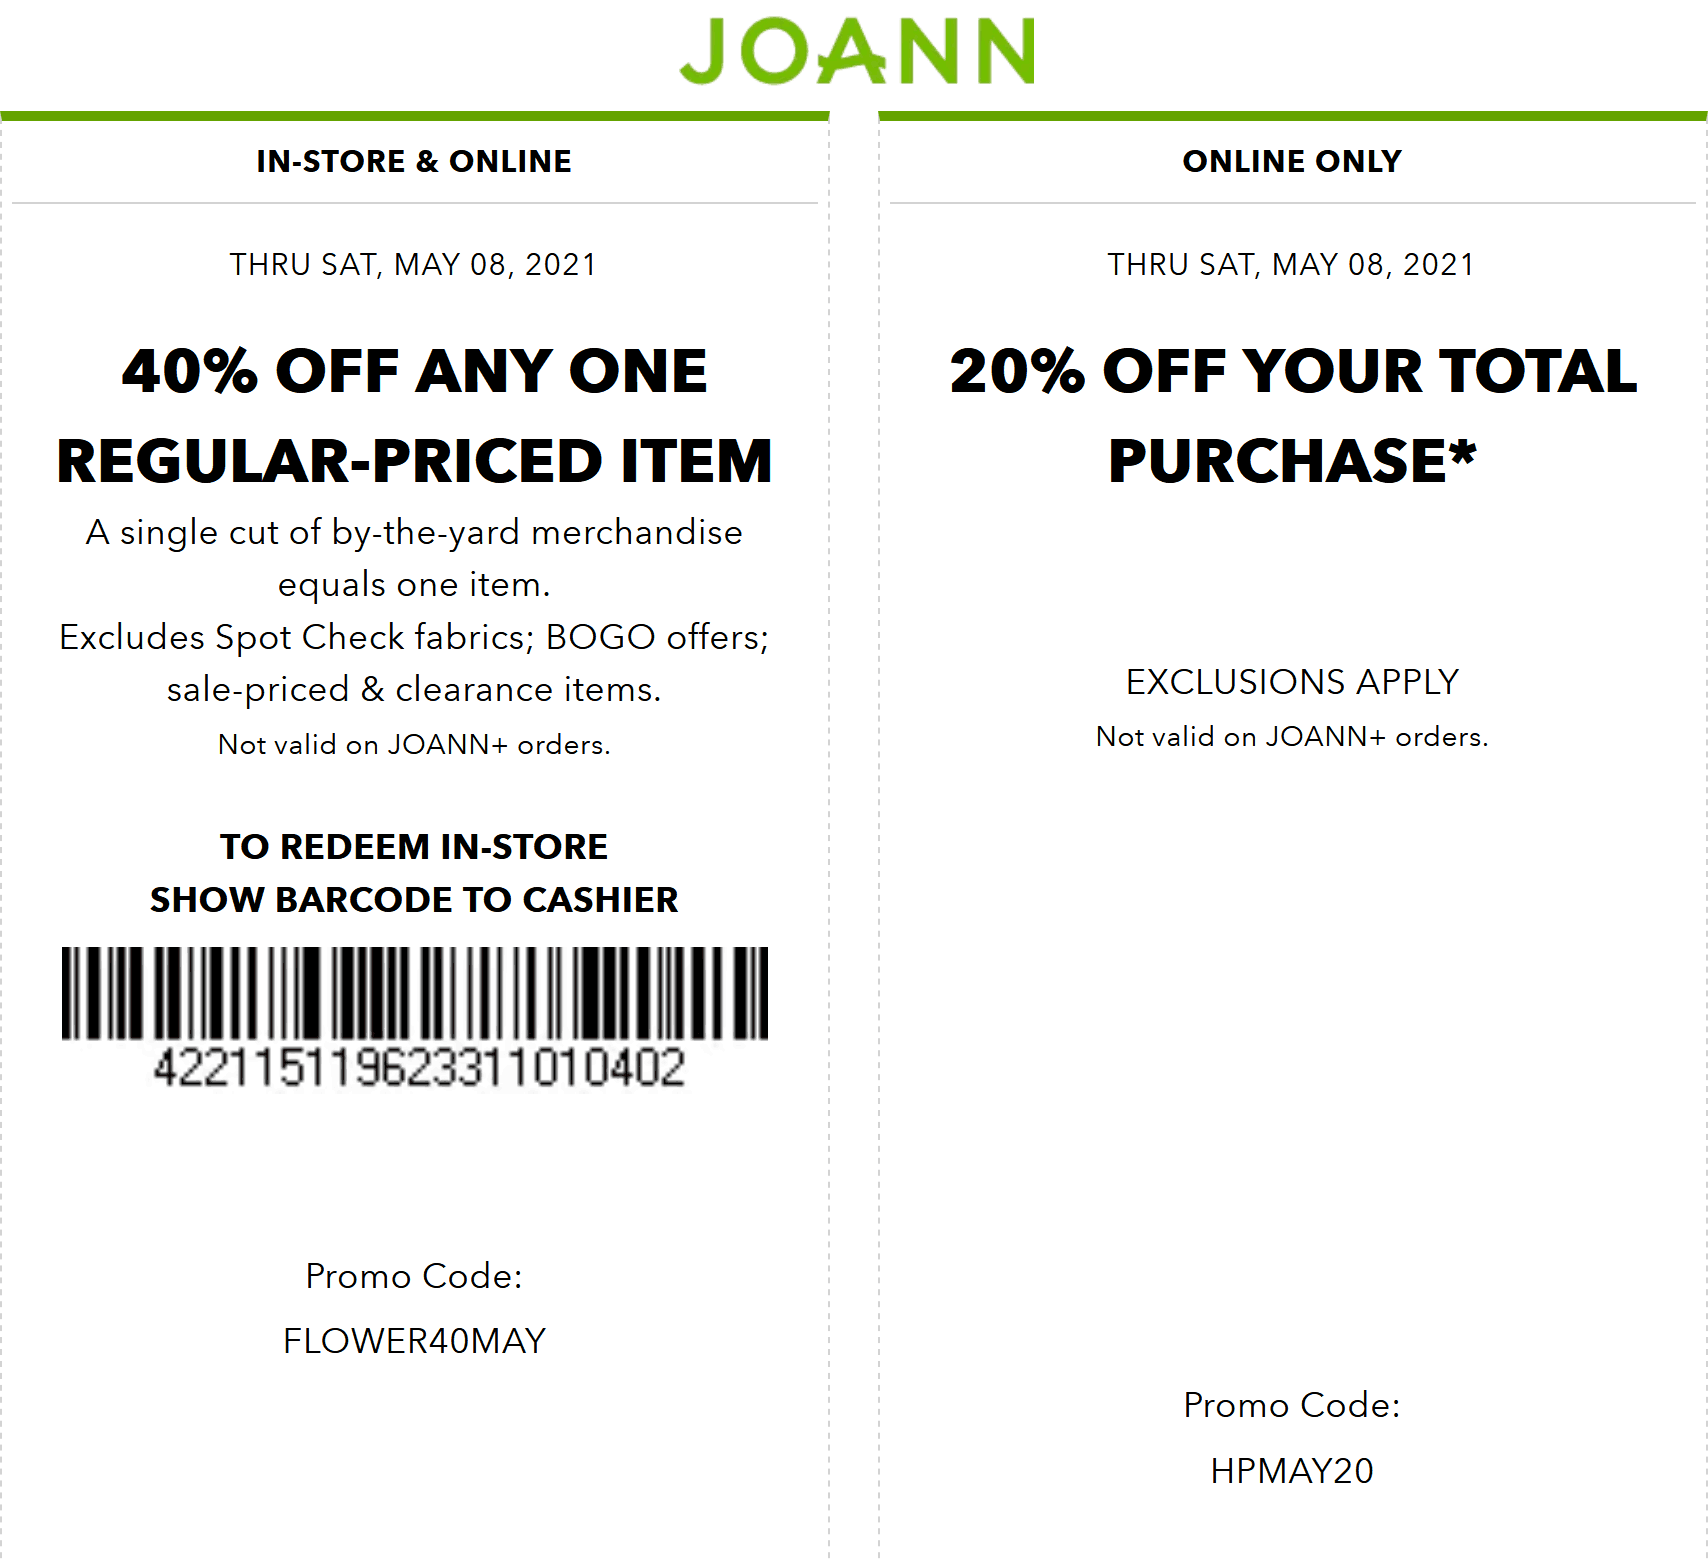 Joann coupons & promo code for [June 2021]